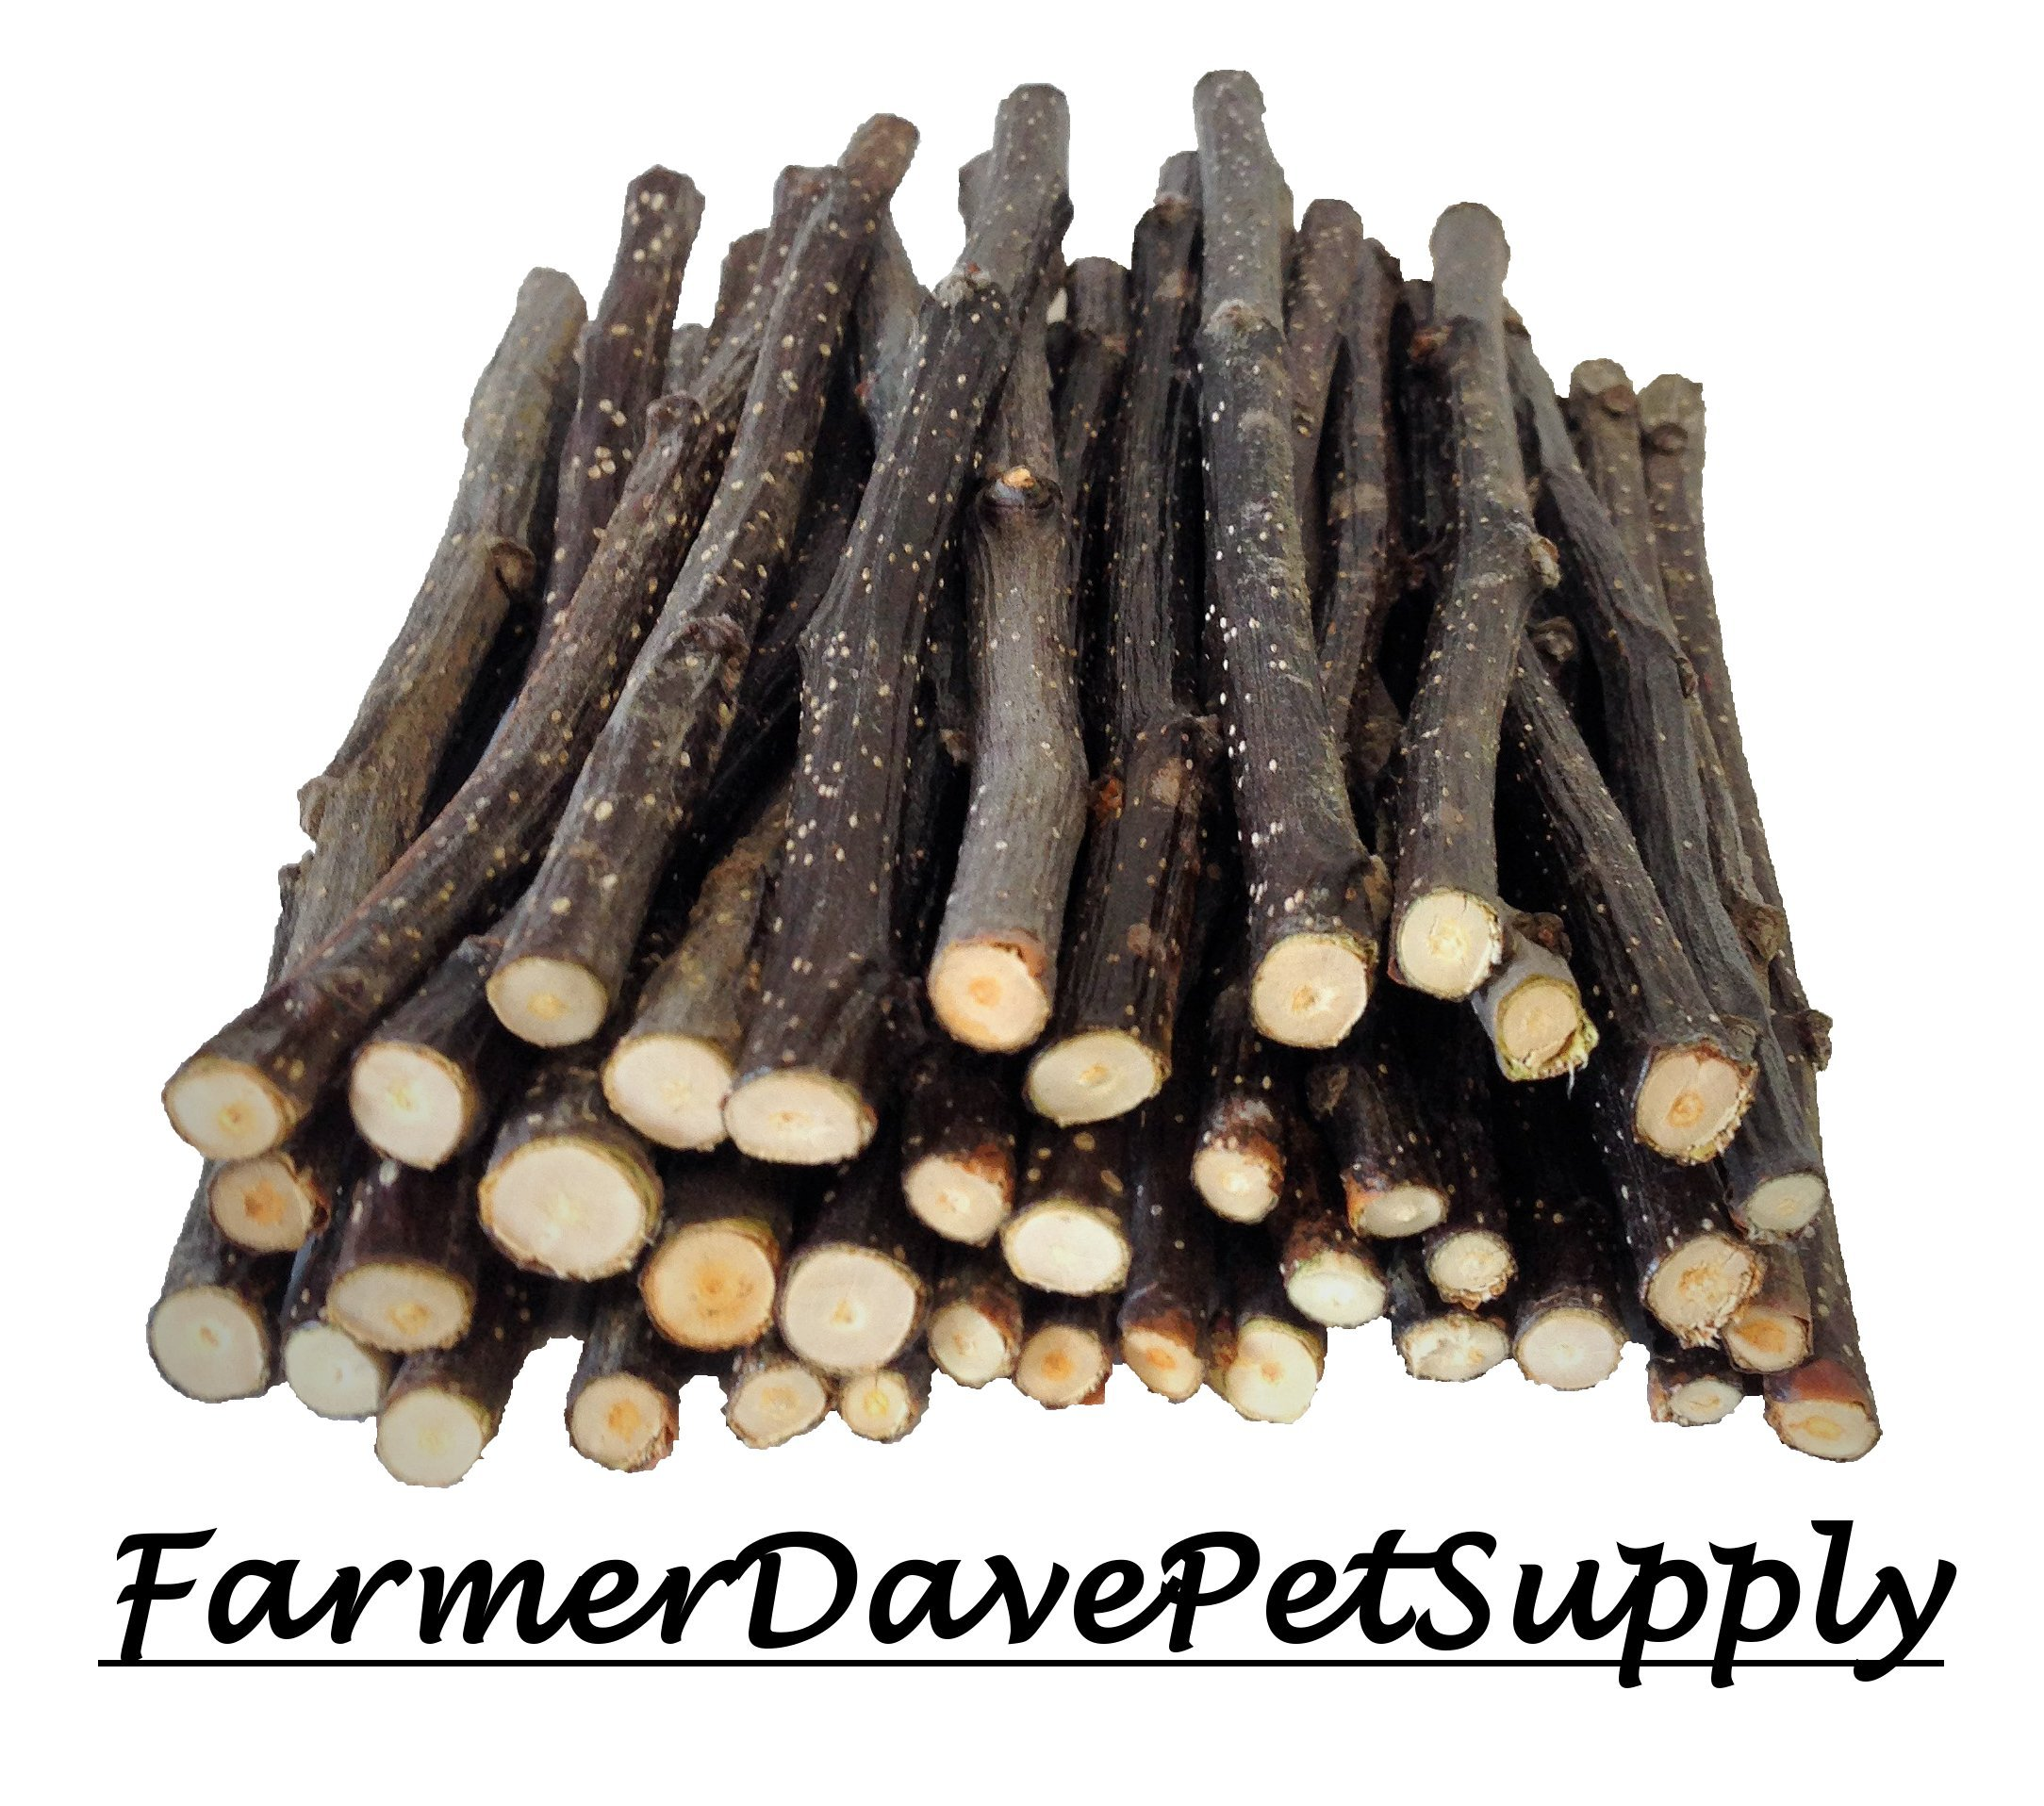 FarmerDavePetSupply 40 Apple Thin CHEW Sticks for Small Animals